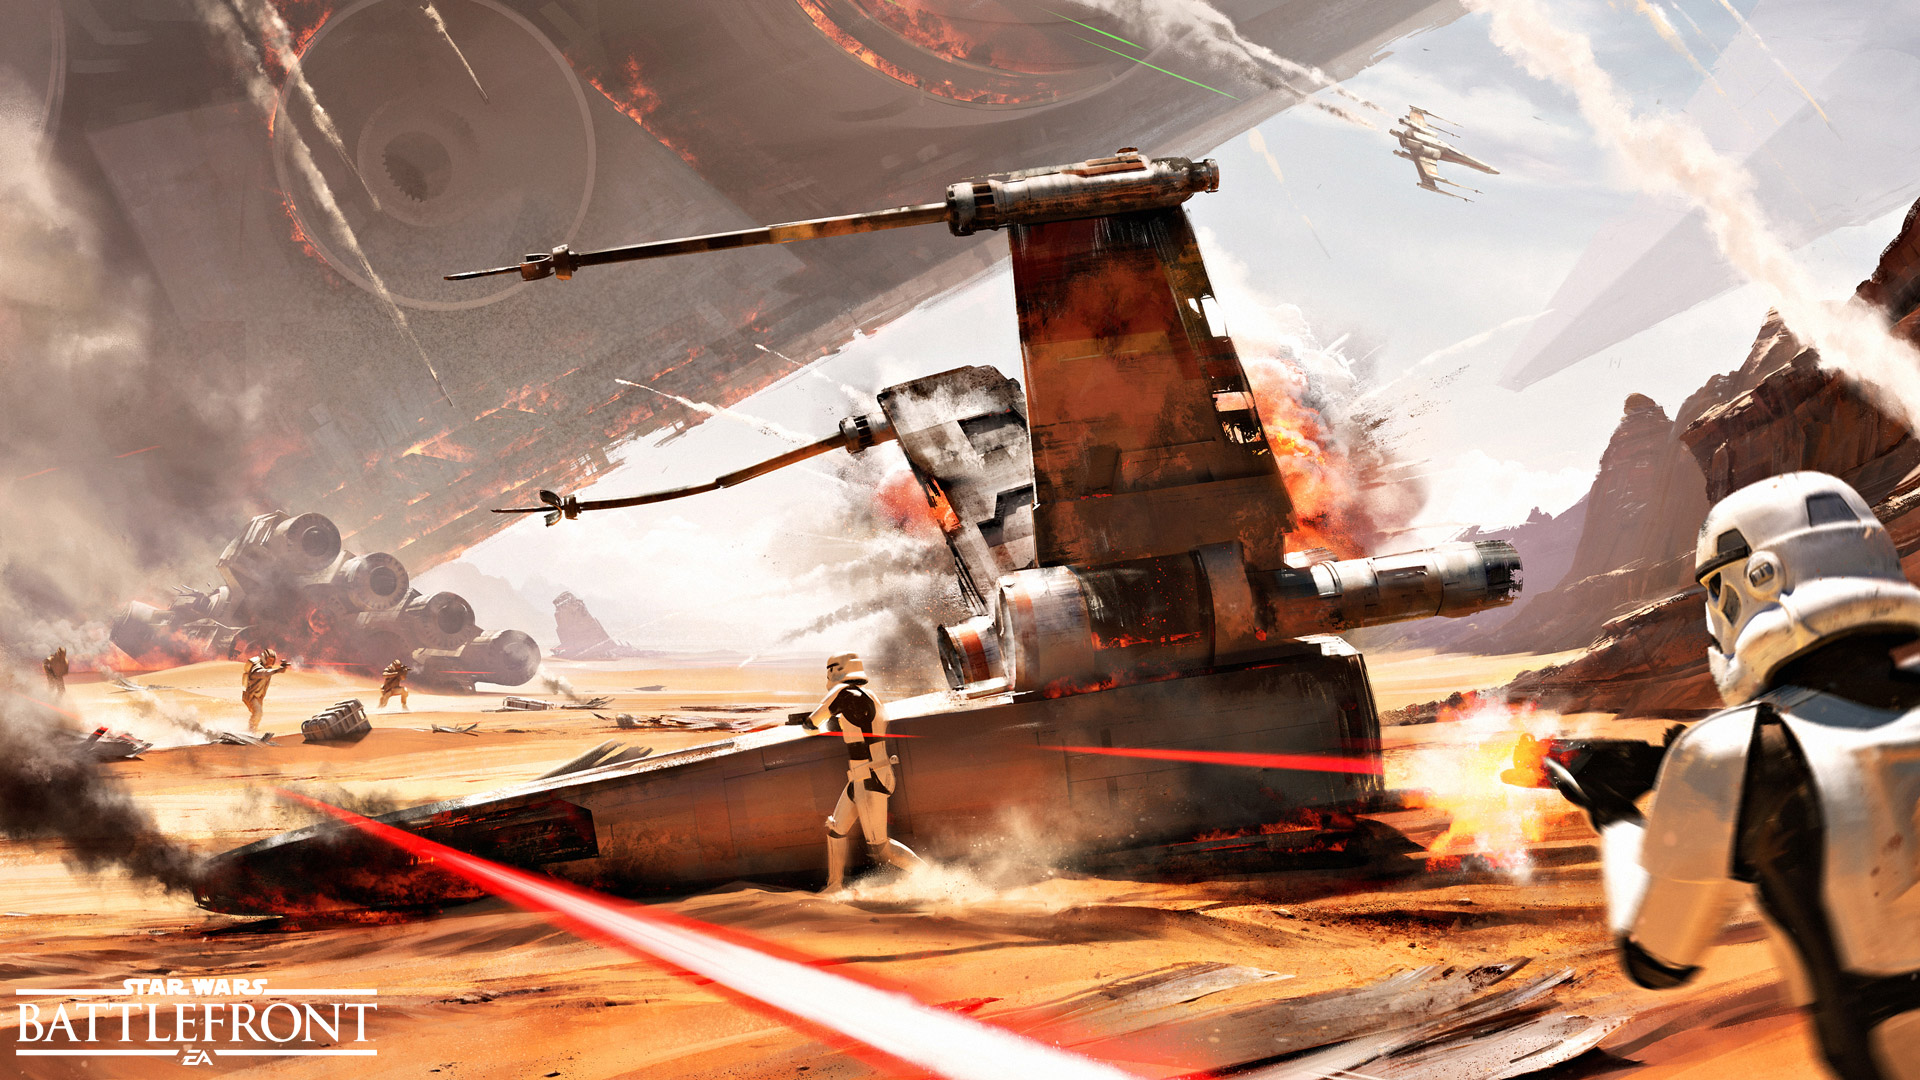 Arte conceitual da Batalha de Jakku